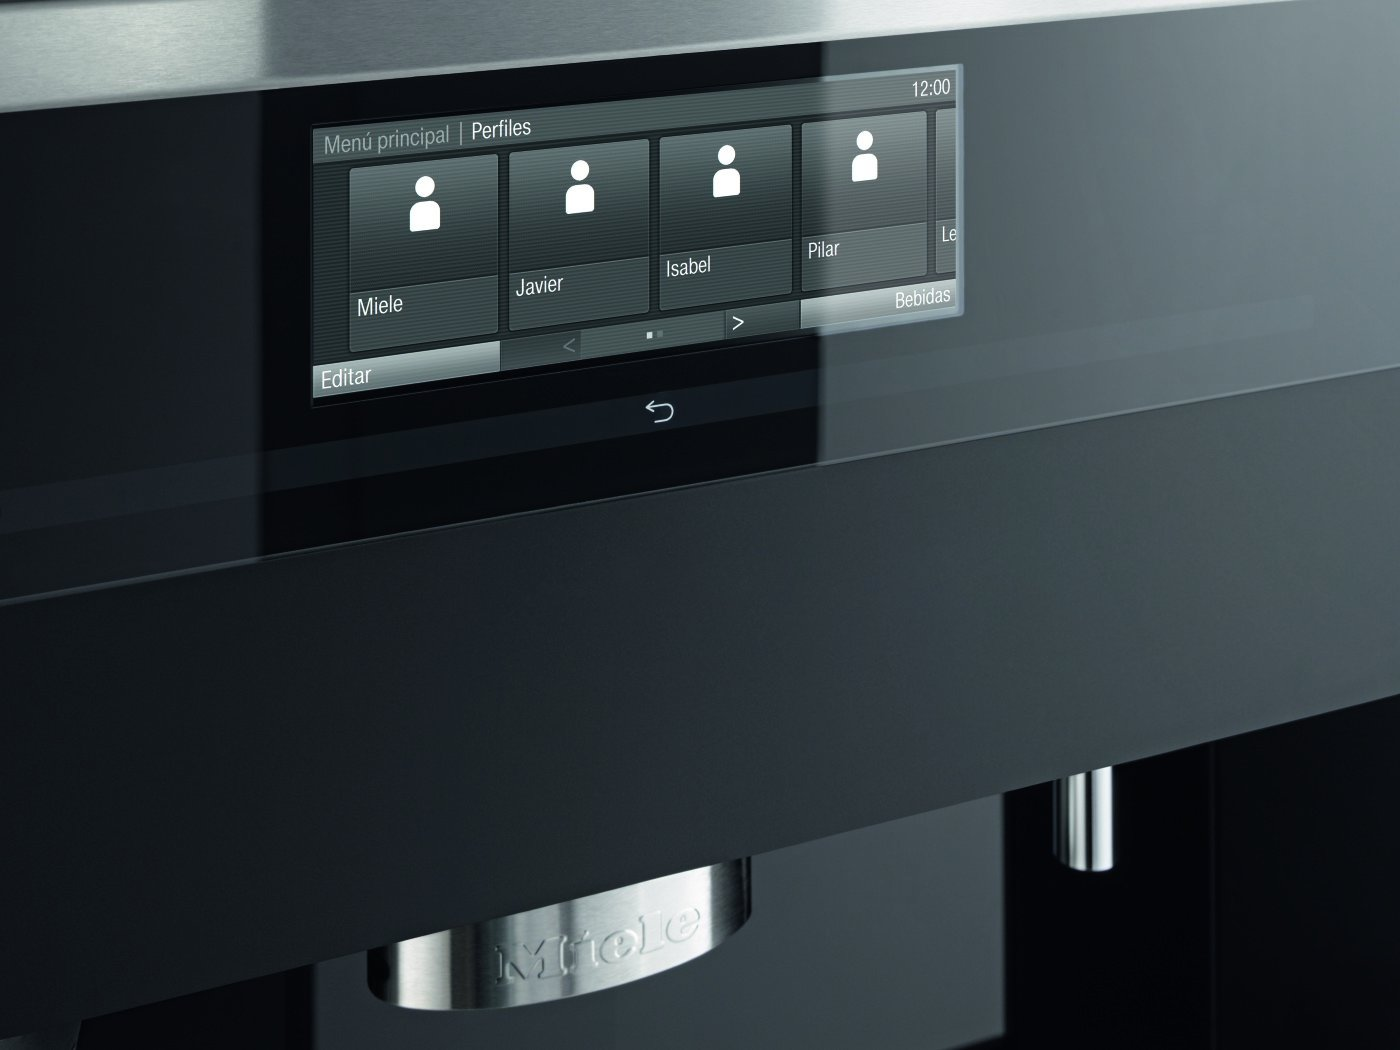 Amazon.com: Miele CVA6800 60cm Coffee System, PureLine, CTS: Office Products